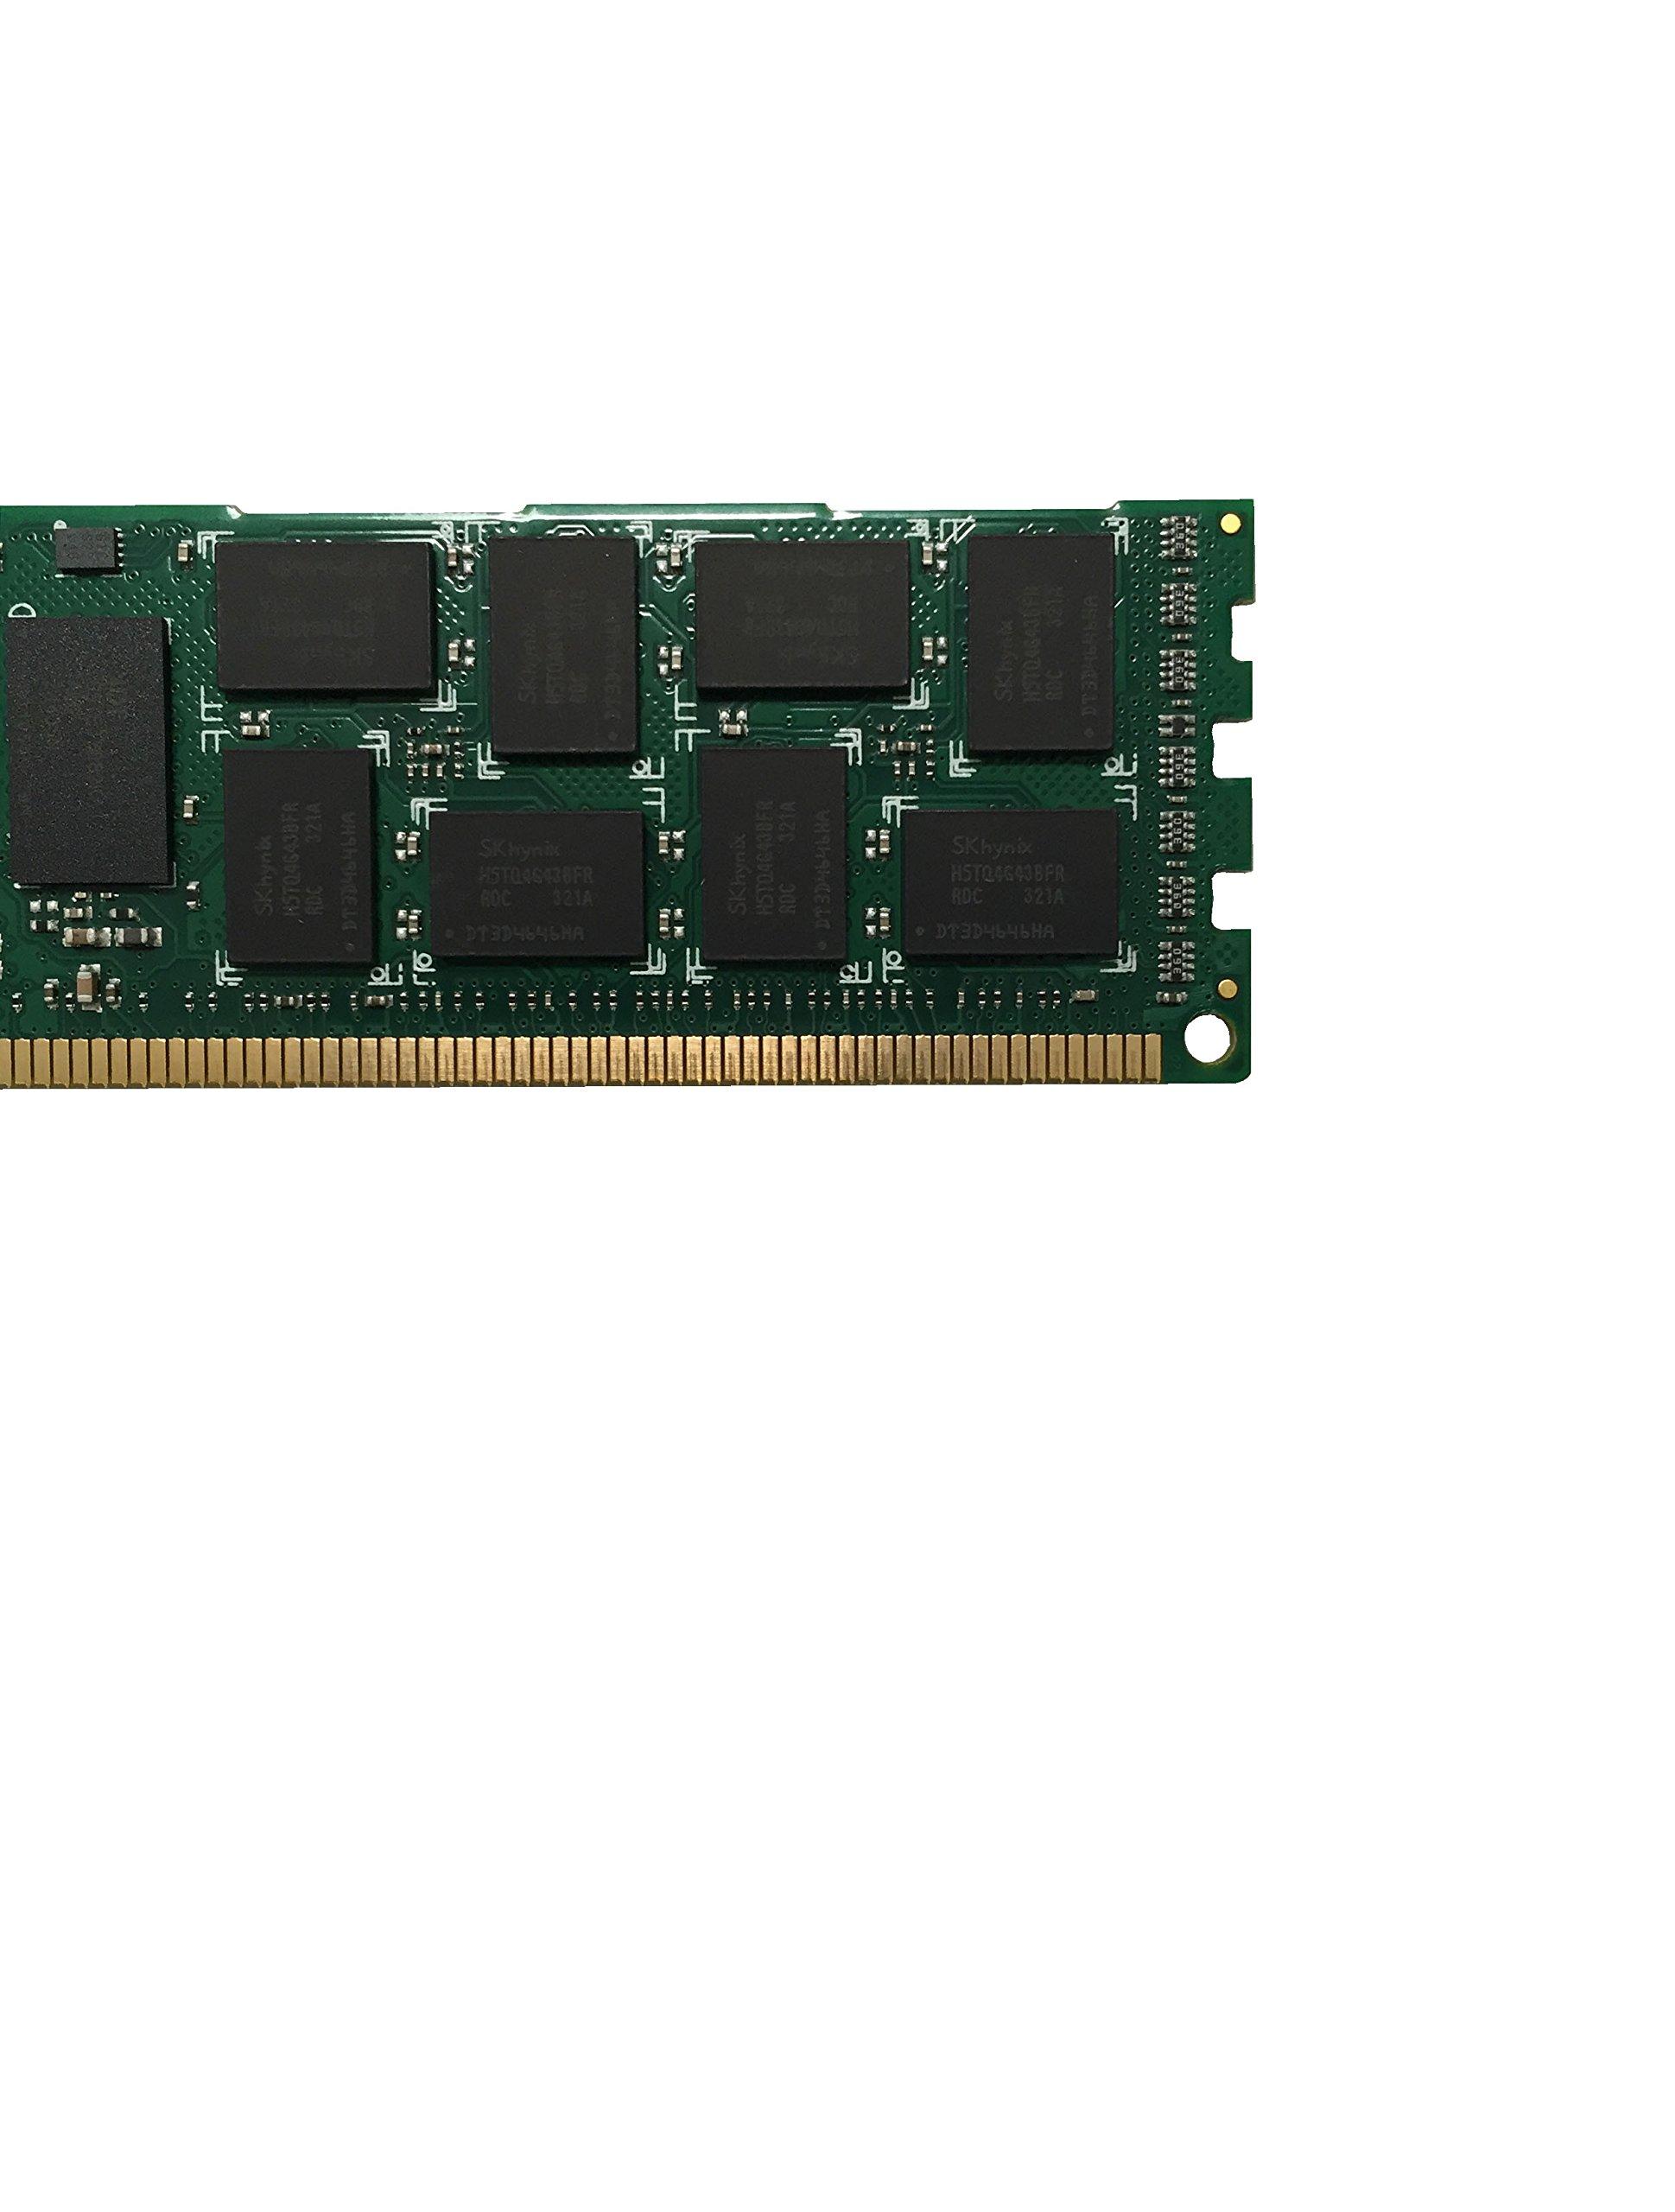 Adamanta 32GB (2x16GB) Server Memory Upgrade for Dell PowerEdge T320 DDR3 1600Mhz PC3-12800 ECC Registered 2Rx4 CL11 1.5v by Adamanta Memory (Image #4)